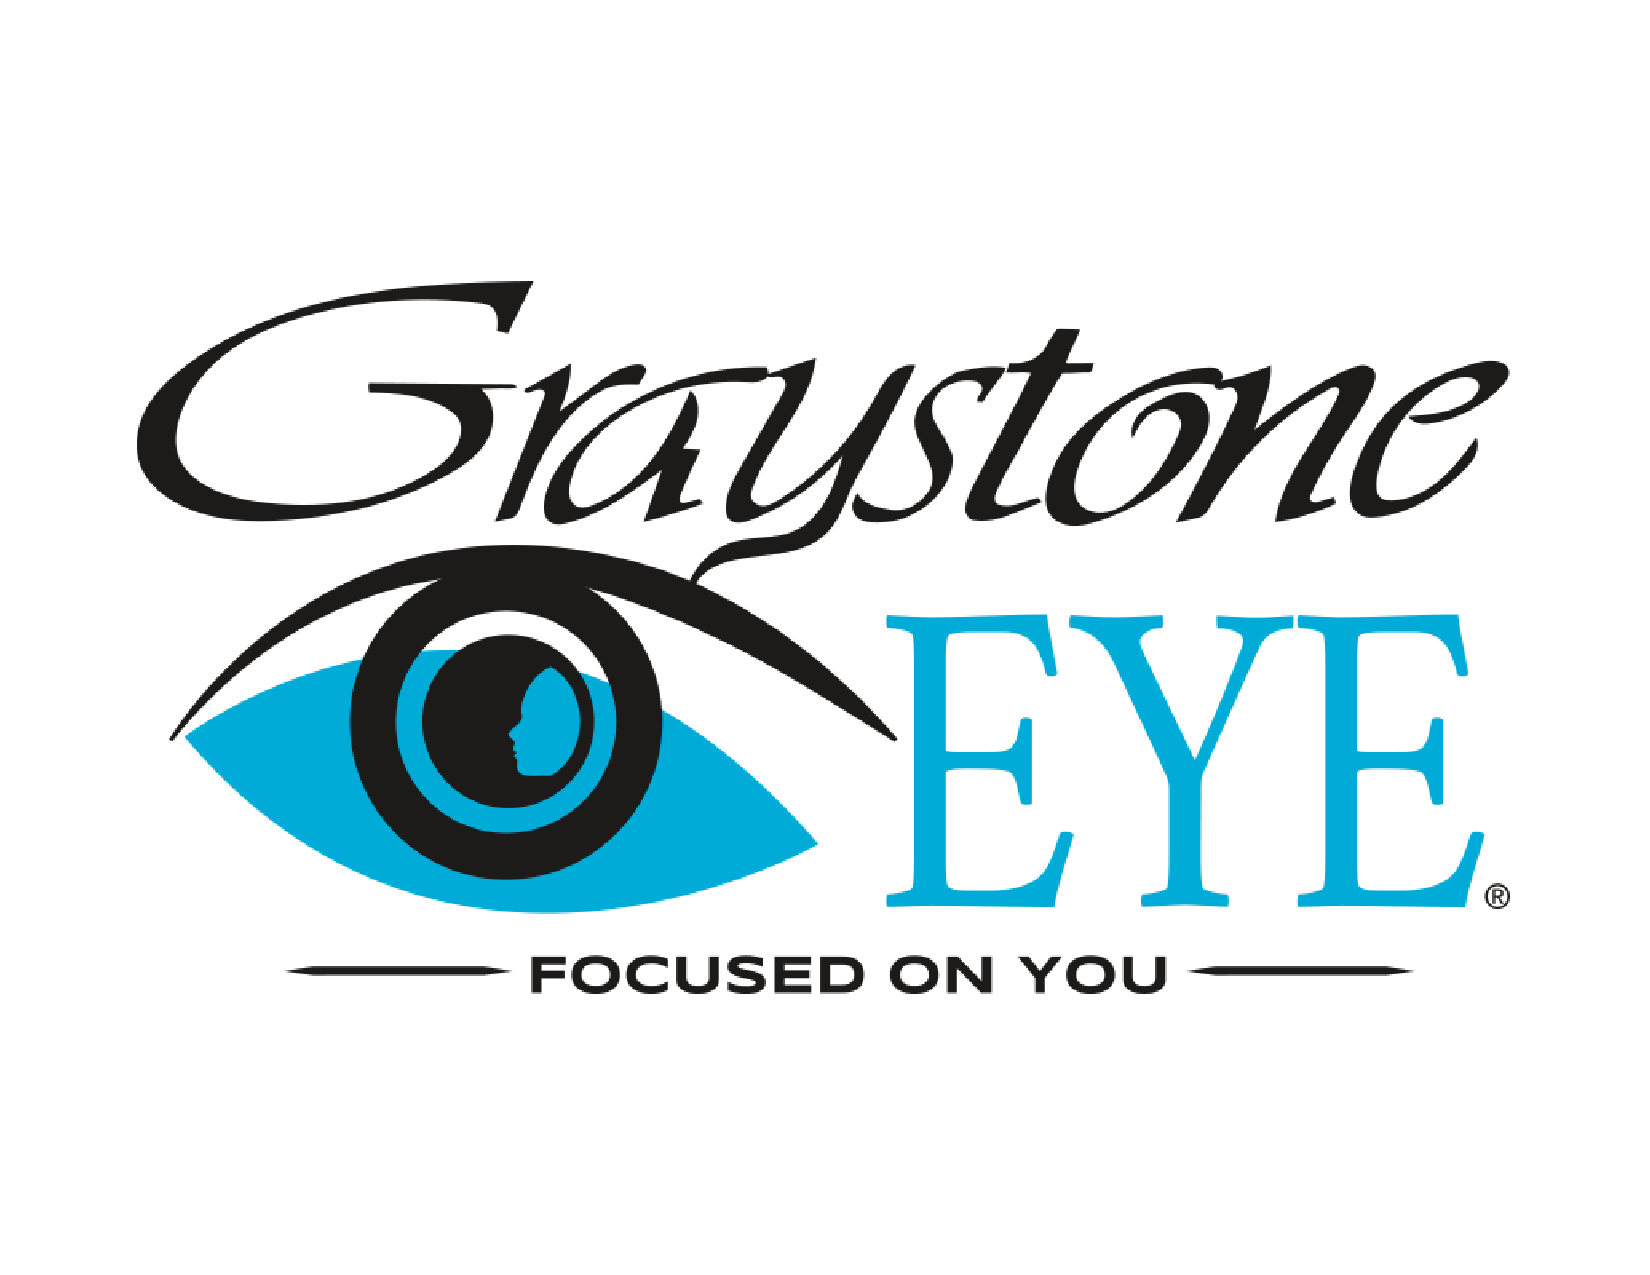 Graystone Eye